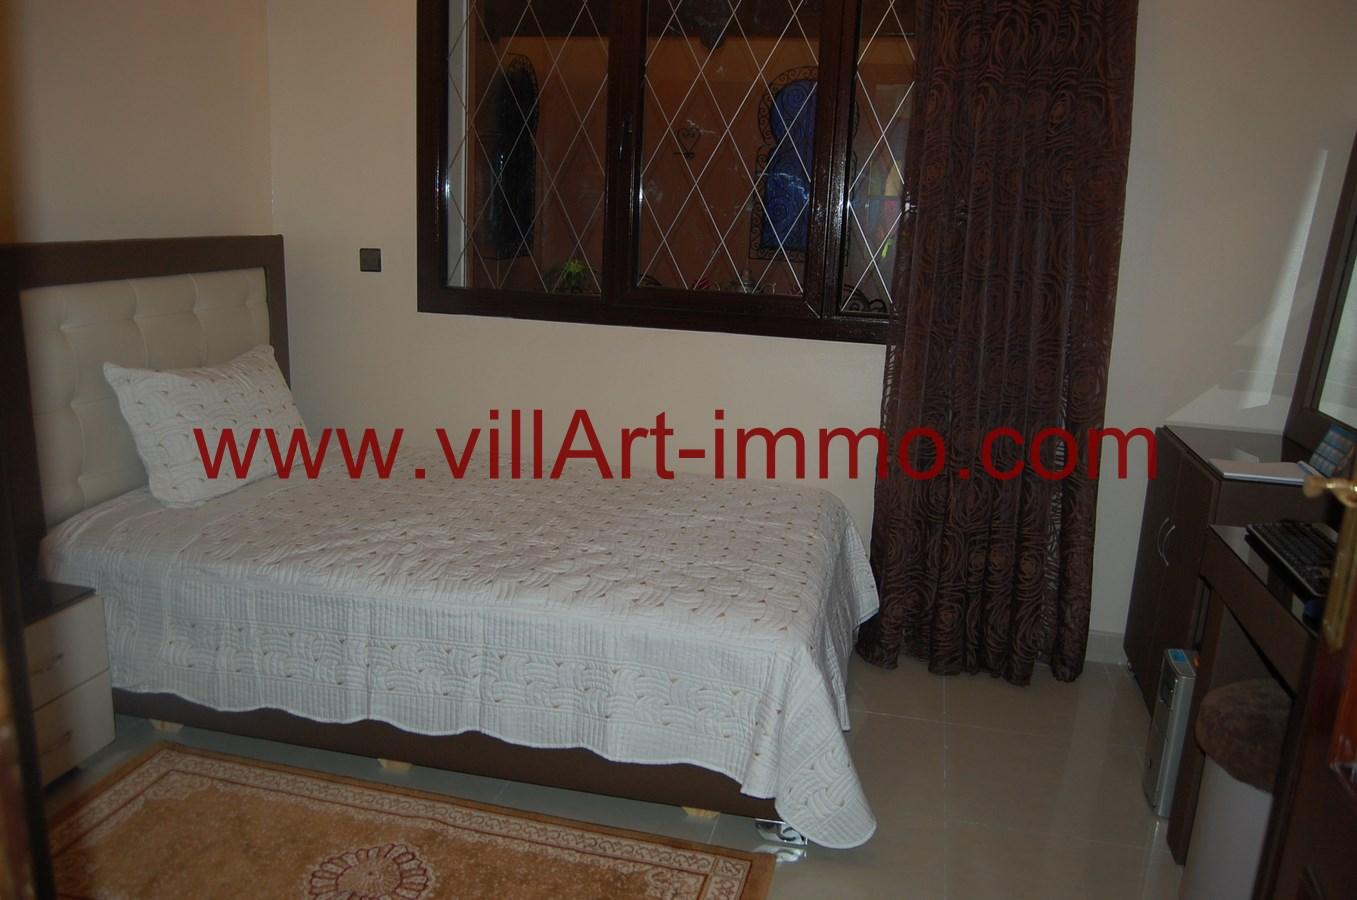 9-location-appartement-meuble-iberia-tanger-chambre-1-l895-villart-immo